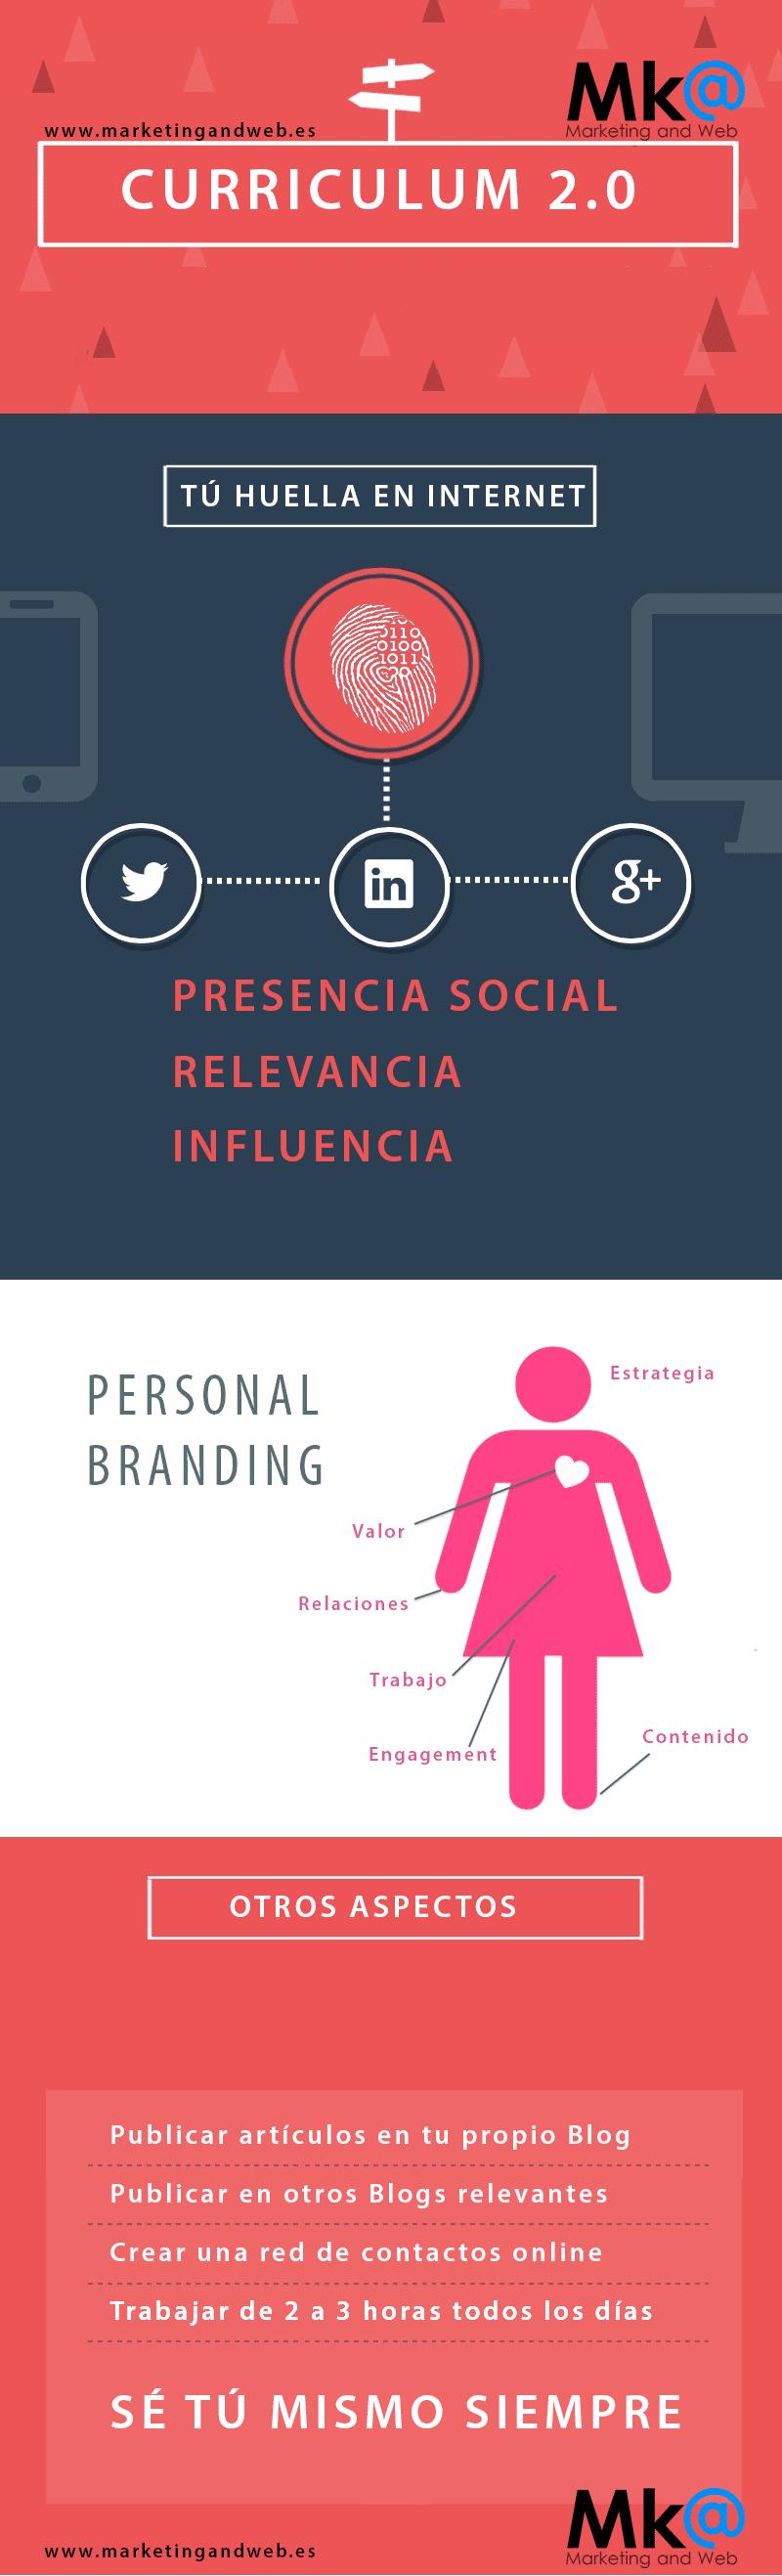 branding personas infografía